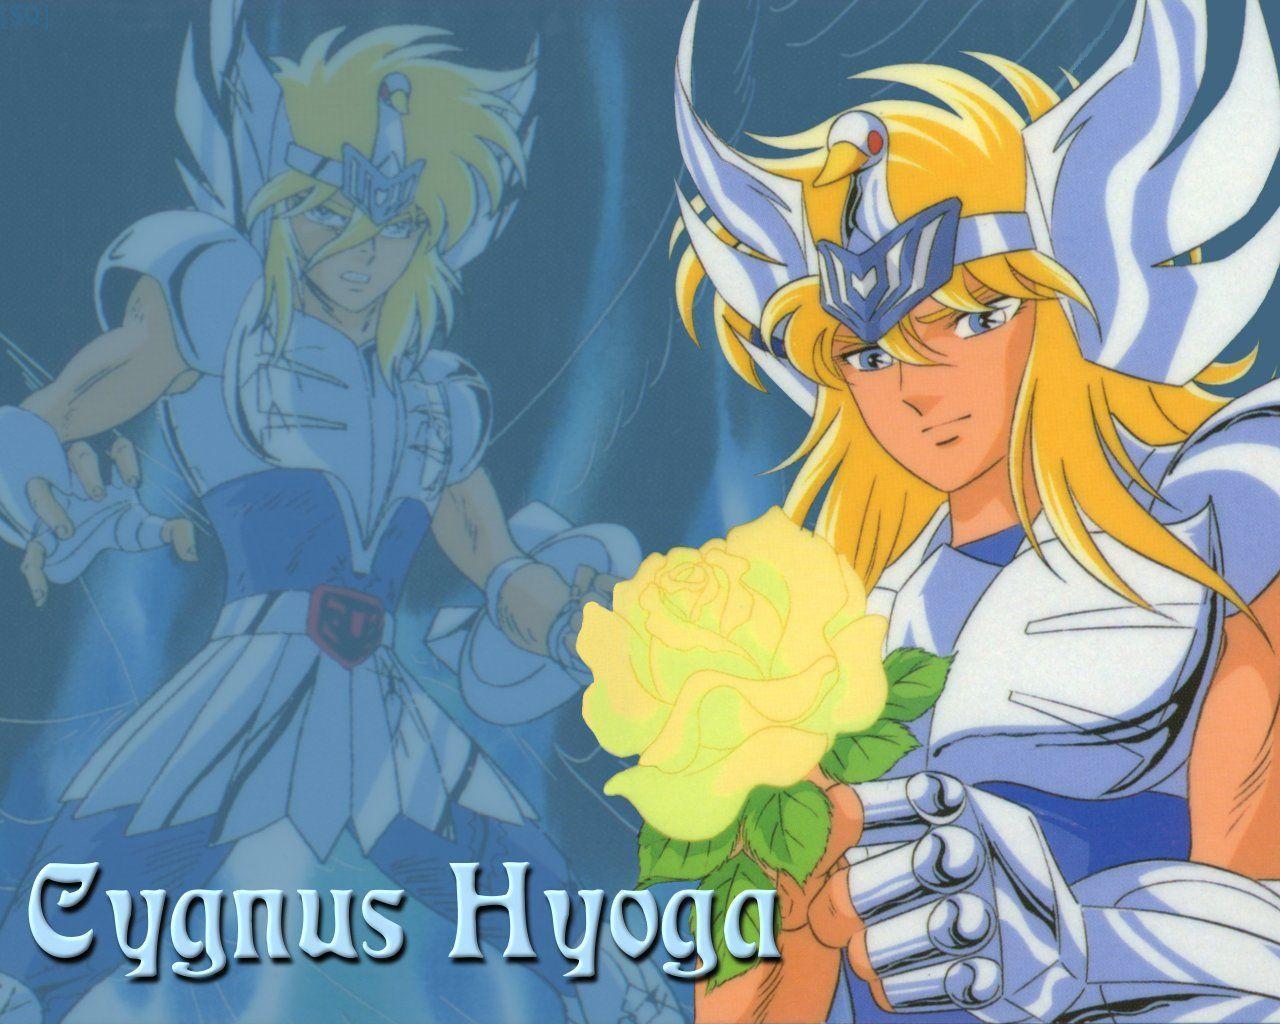 Hyoga saint seiya knights of the zodiac picture, Hyoga saint seiya ...